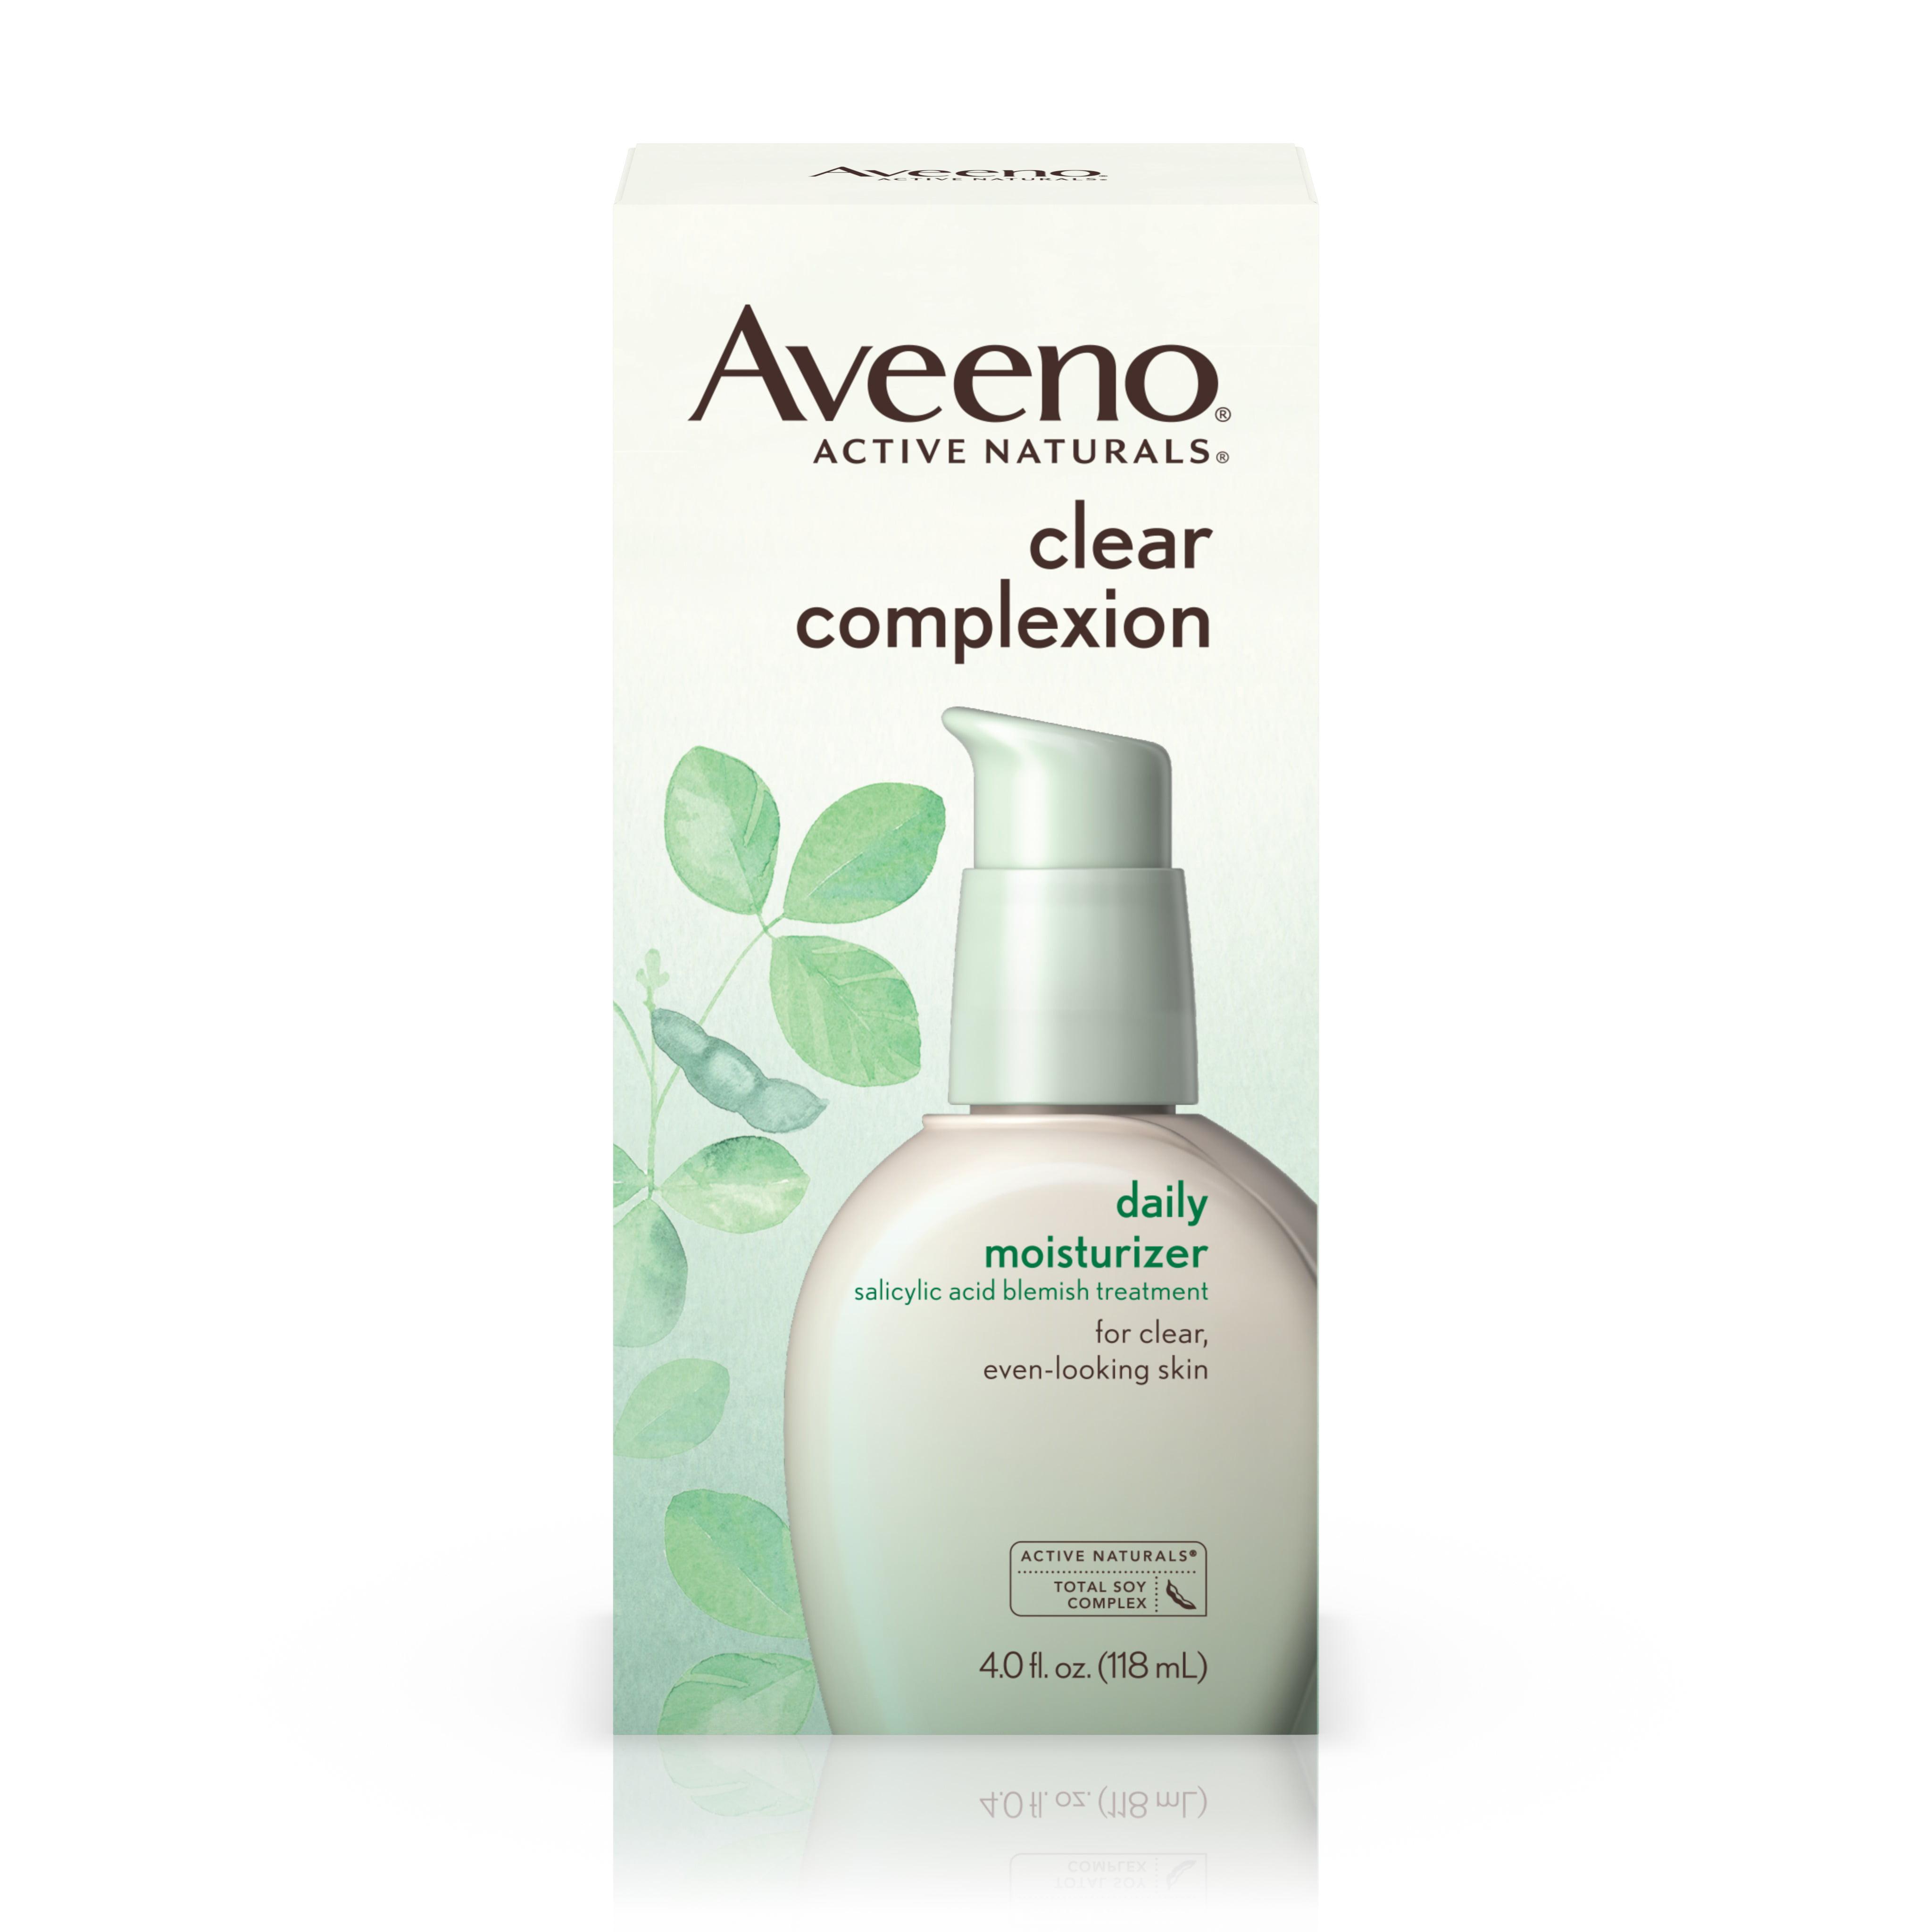 Aveeno Clear Complexion Blemish Treatment Daily Moisturizer, 4 Oz - Walmart.com